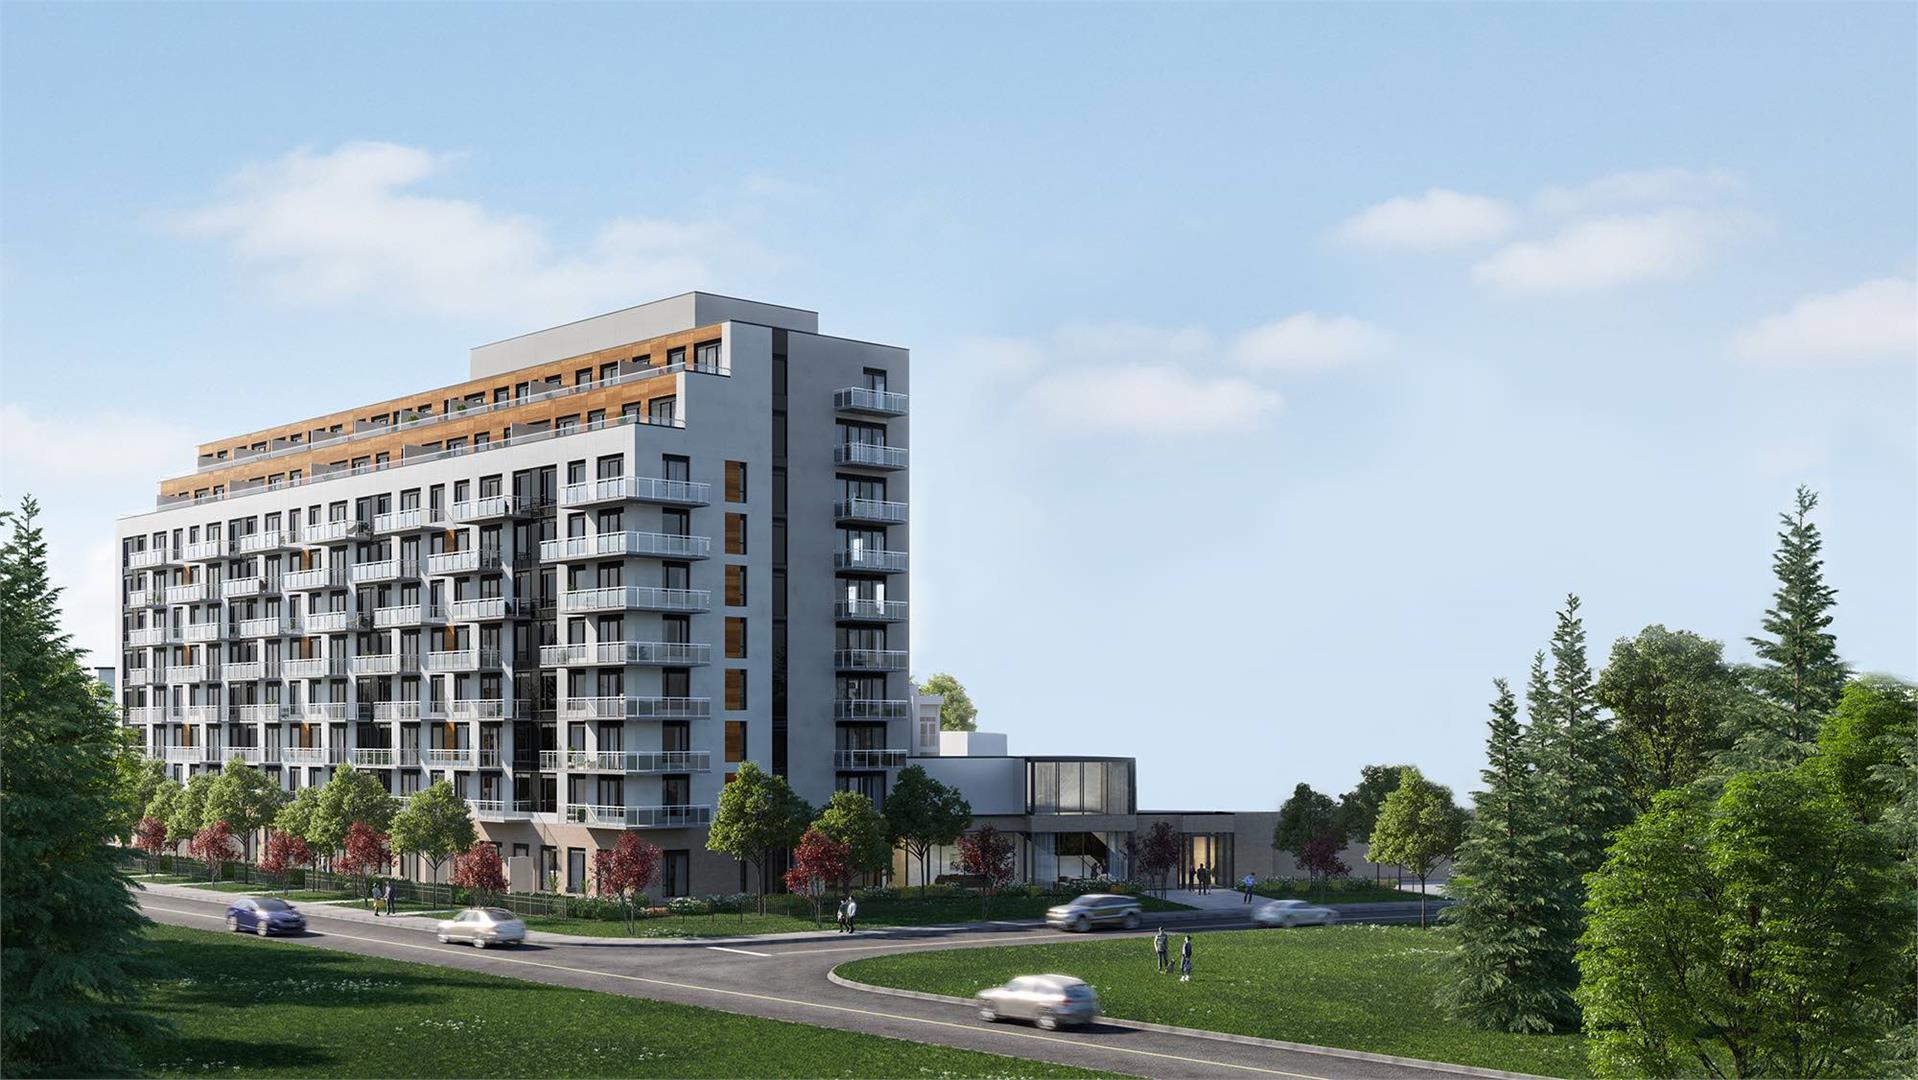 NEXT - Elgin East Phase 2 building 03